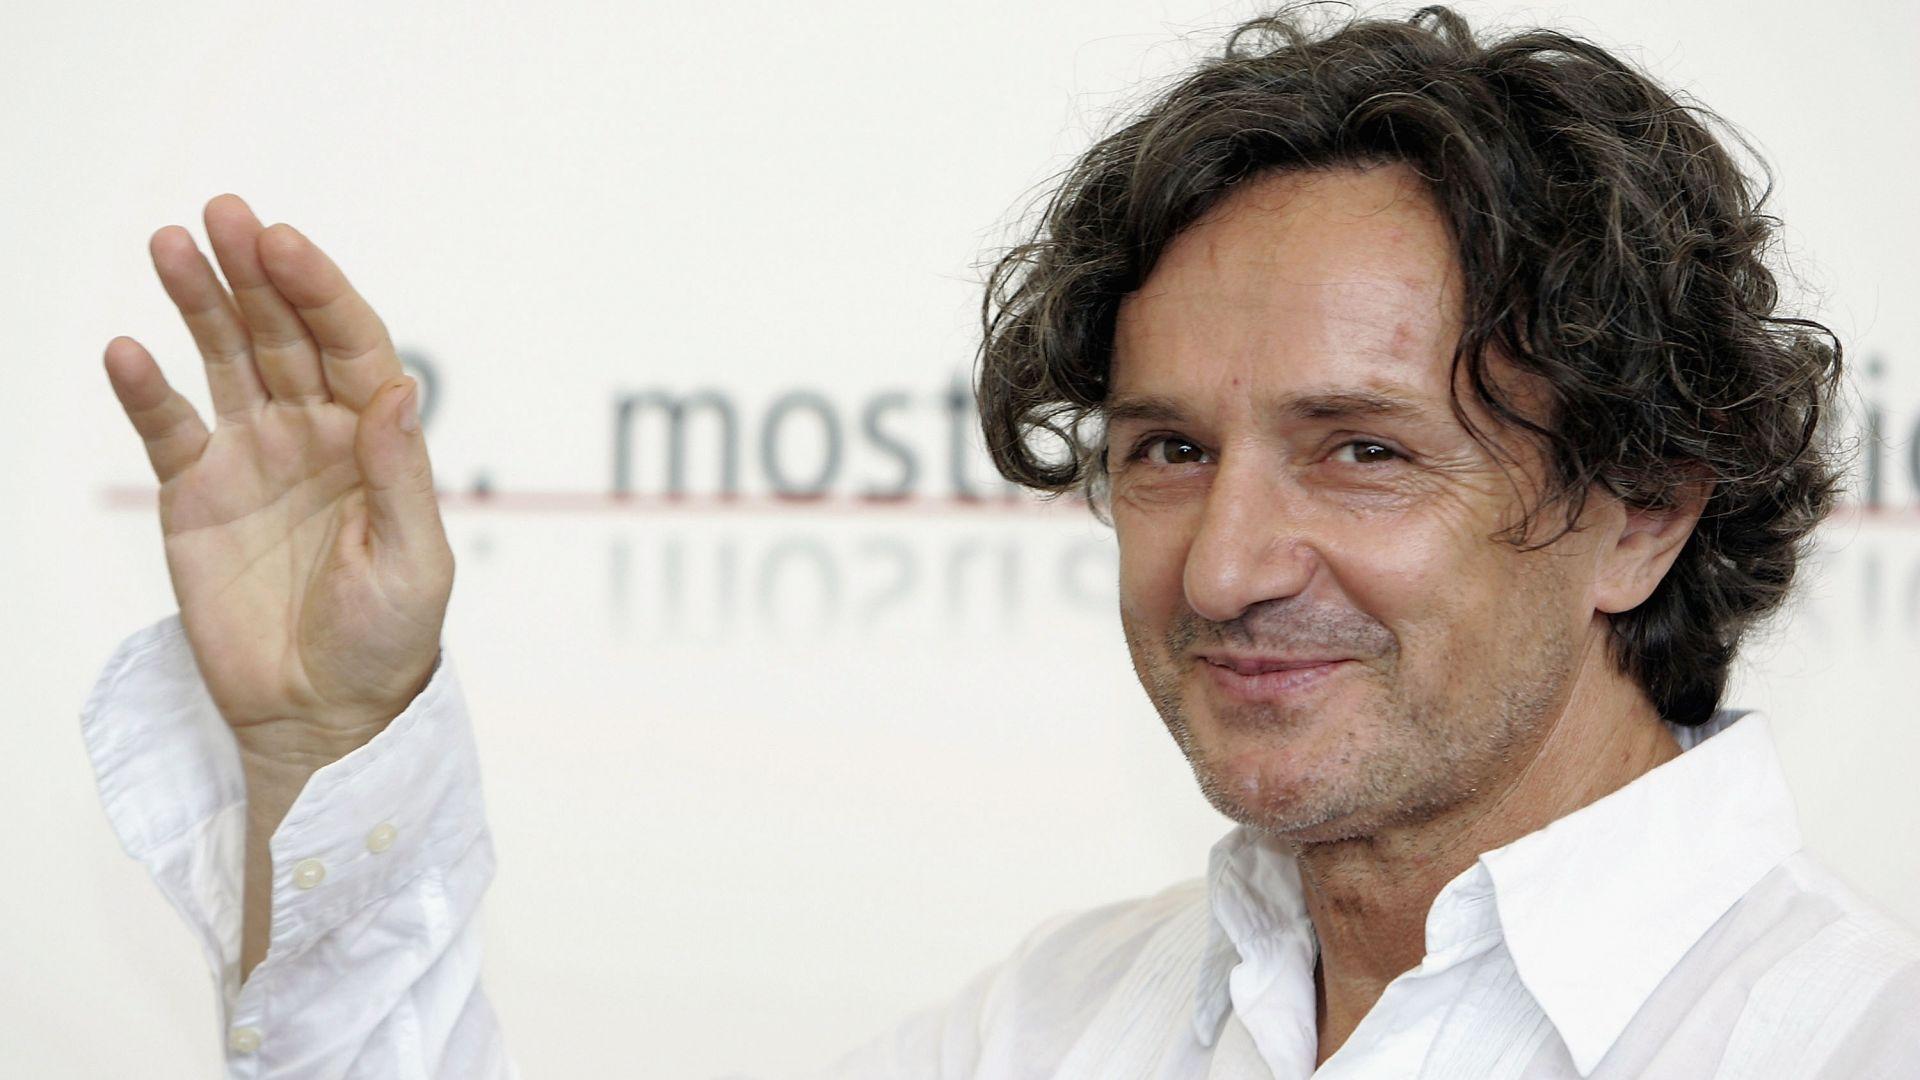 Горан Брегович е осъден да плати 1 млн. евро на Енрико Масиас за плагиатство